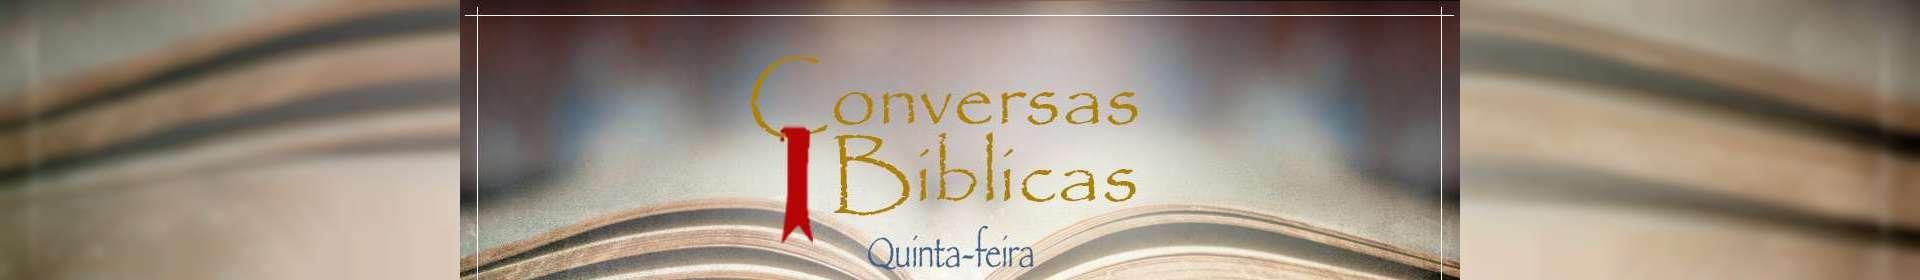 Conversas Bíblicas: Bíblia, Palavra Viva - Parte 2